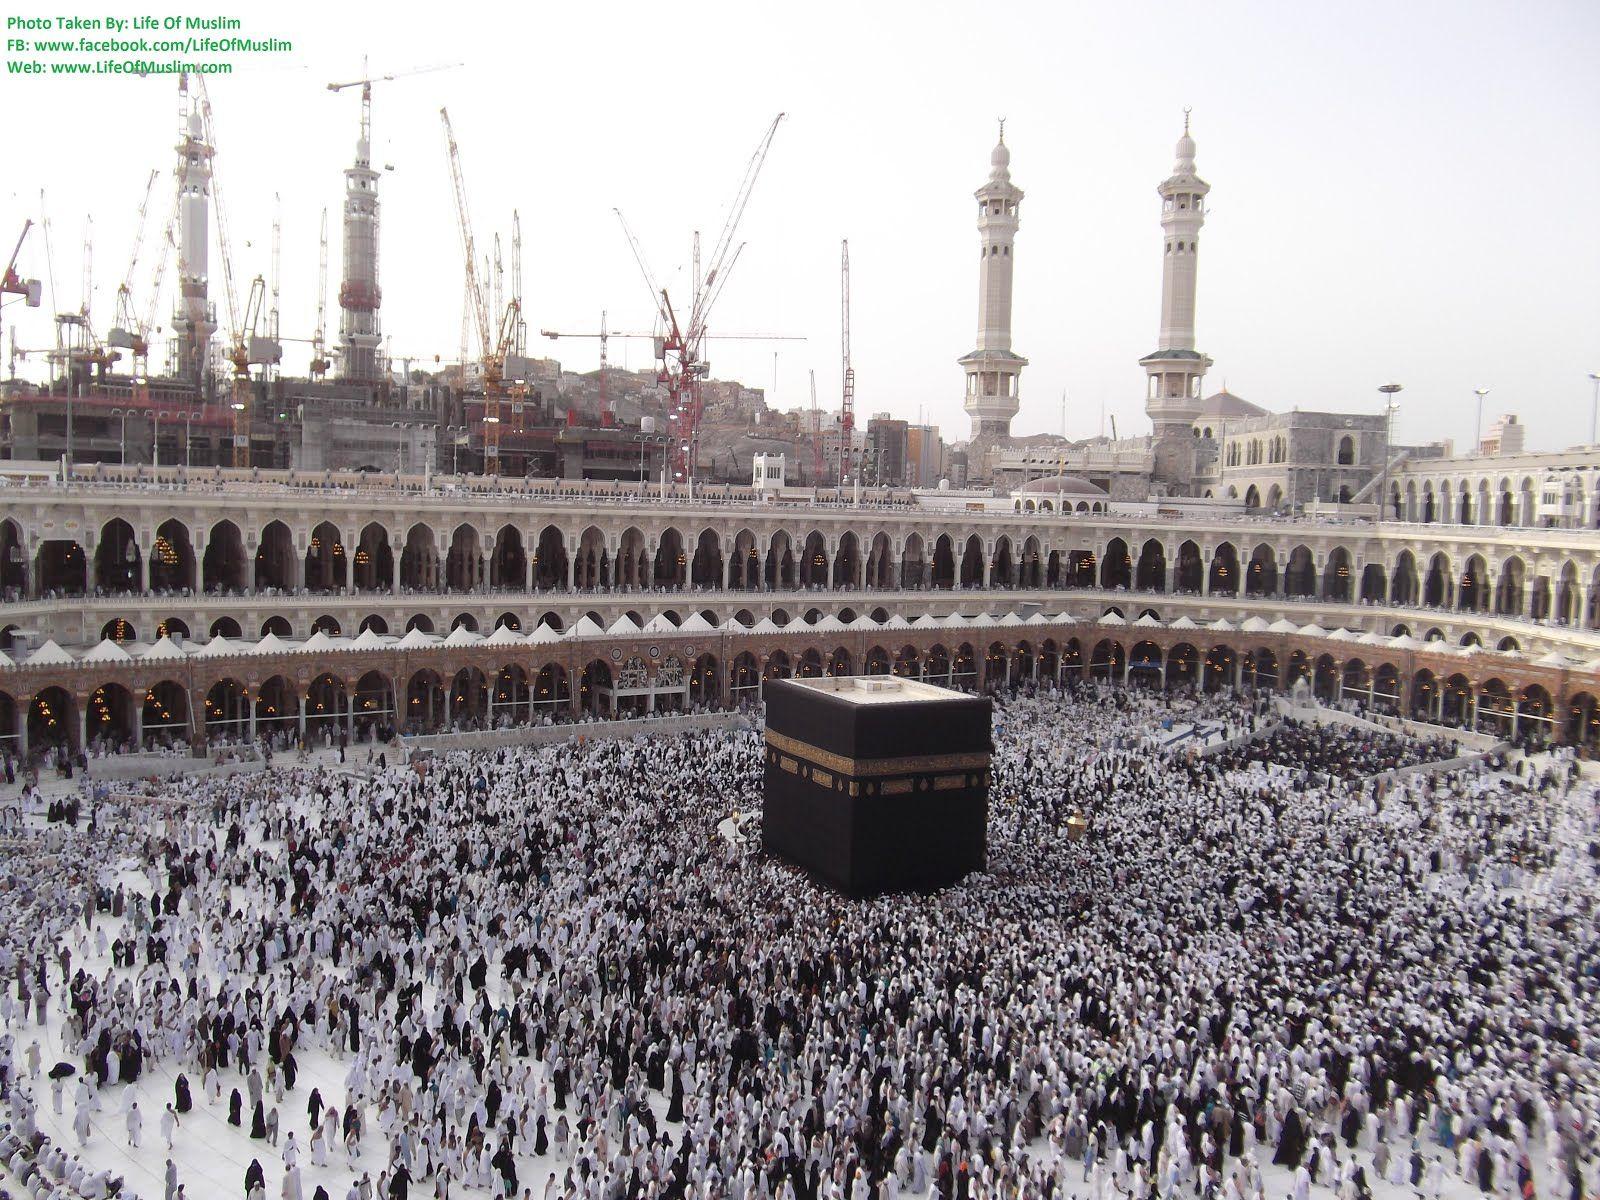 Rare Pictures Of Holy Kaaba Haram Sharif Khana Kaba Photos Life Of Muslim Islam Quran Hadith Islamic Miracles And Videos Kaba Rare Pictures Khana Kaba